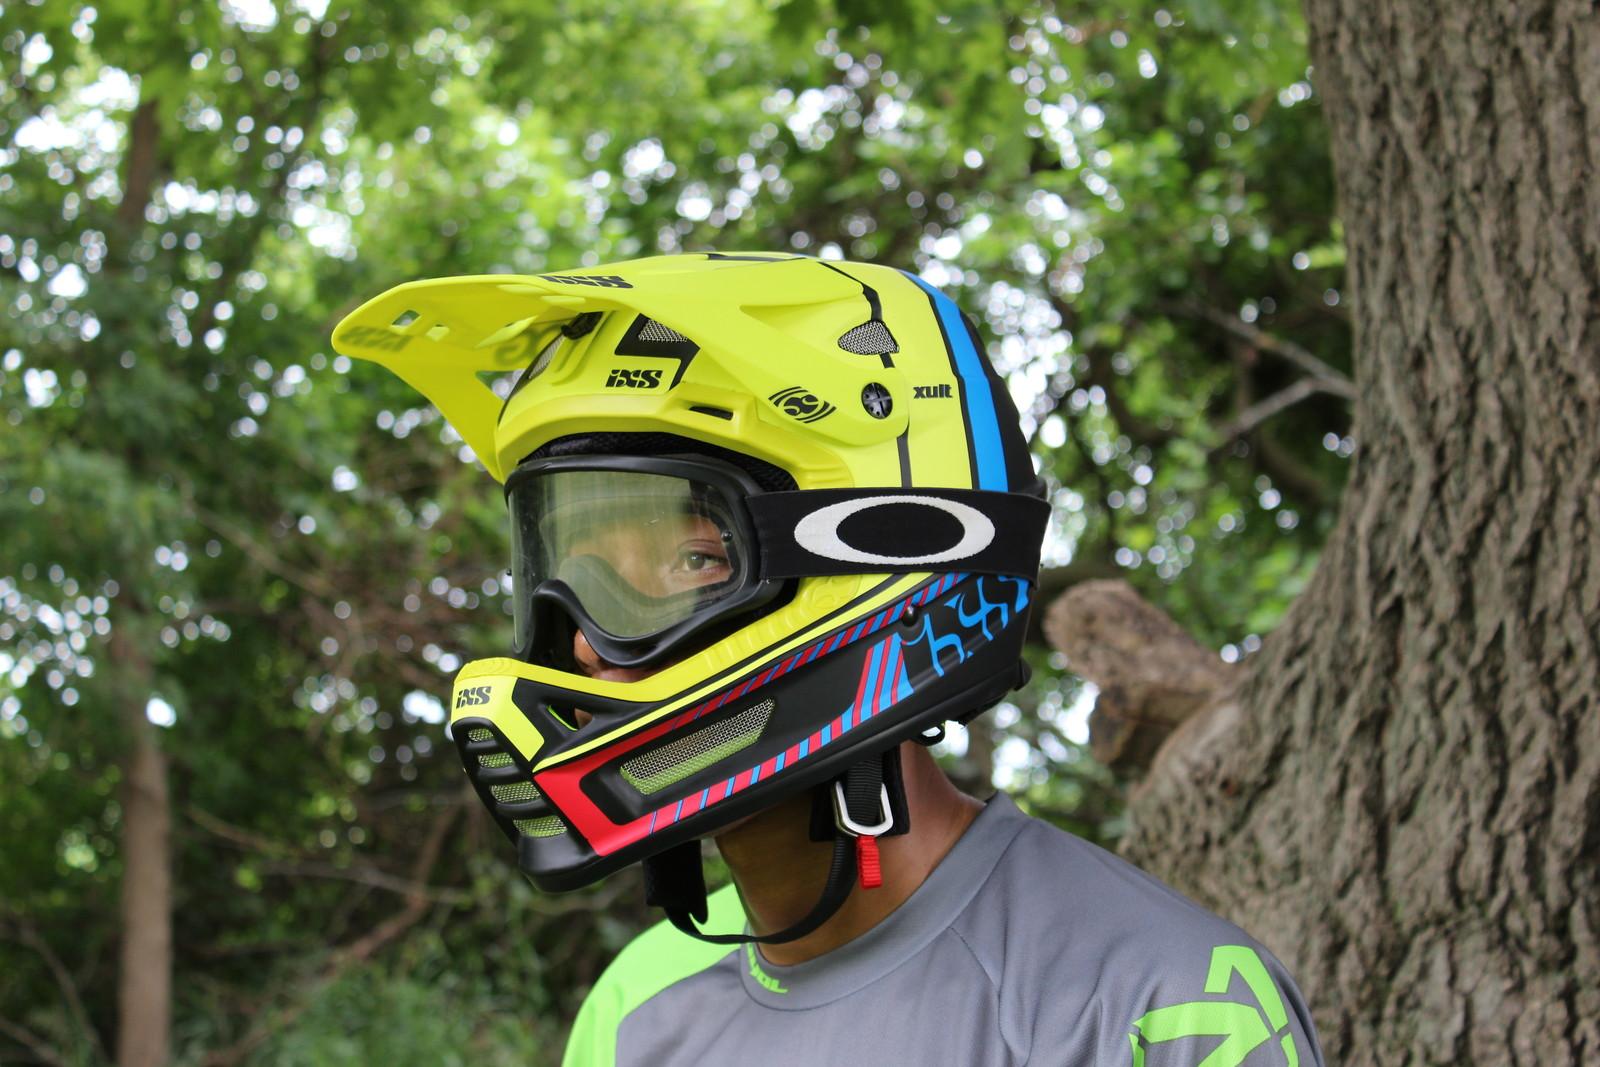 IMG 5427 - MadMaxFlexin - Mountain Biking Pictures - Vital MTB